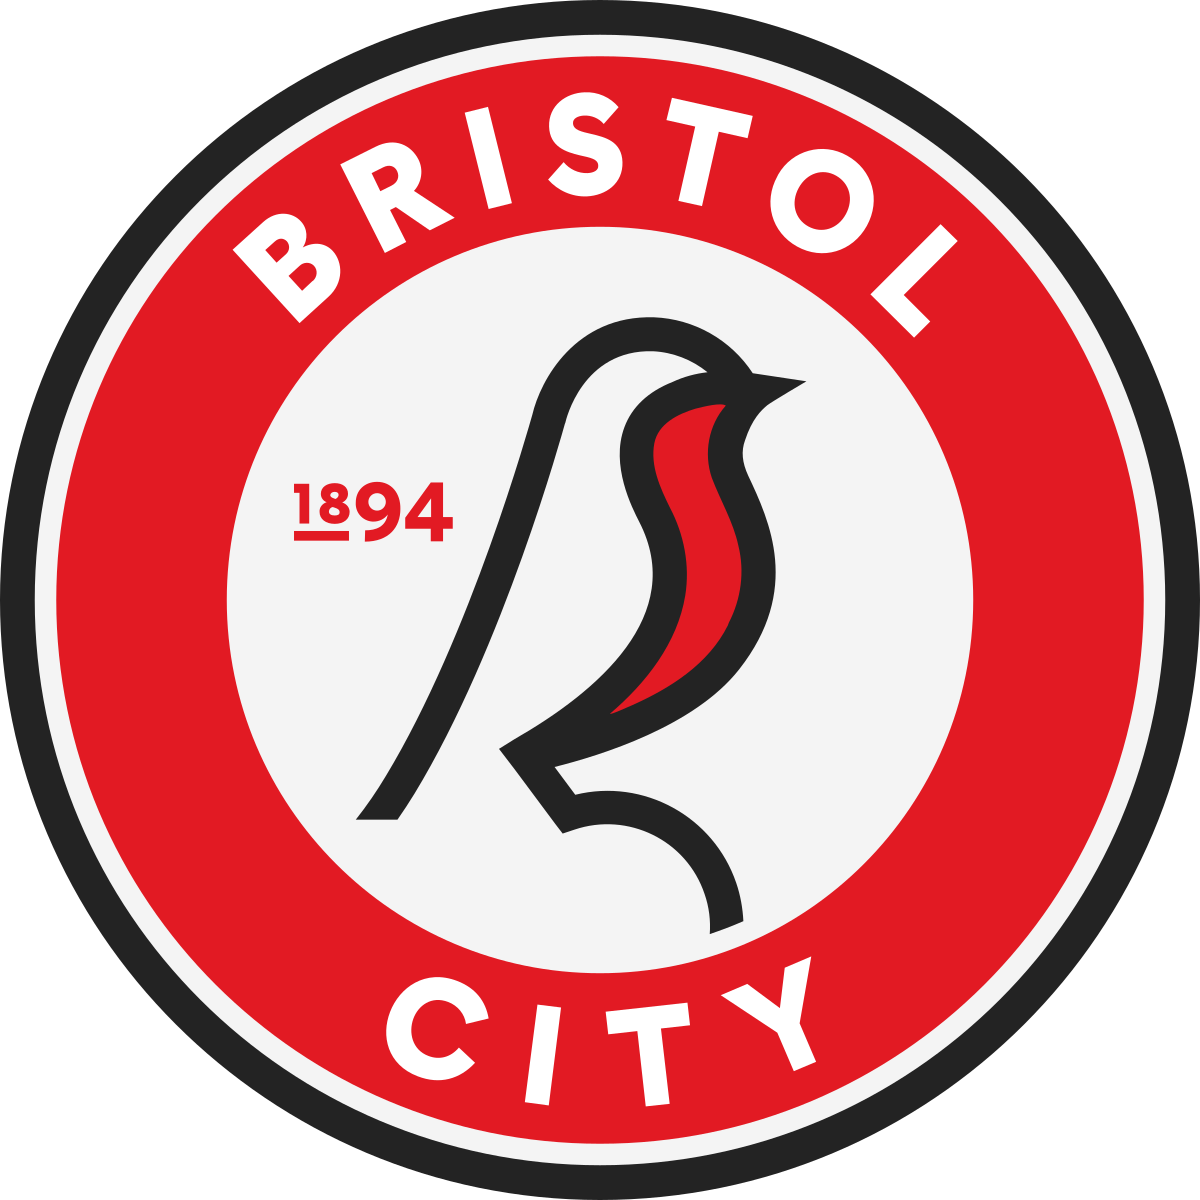 Programme TV Bristol